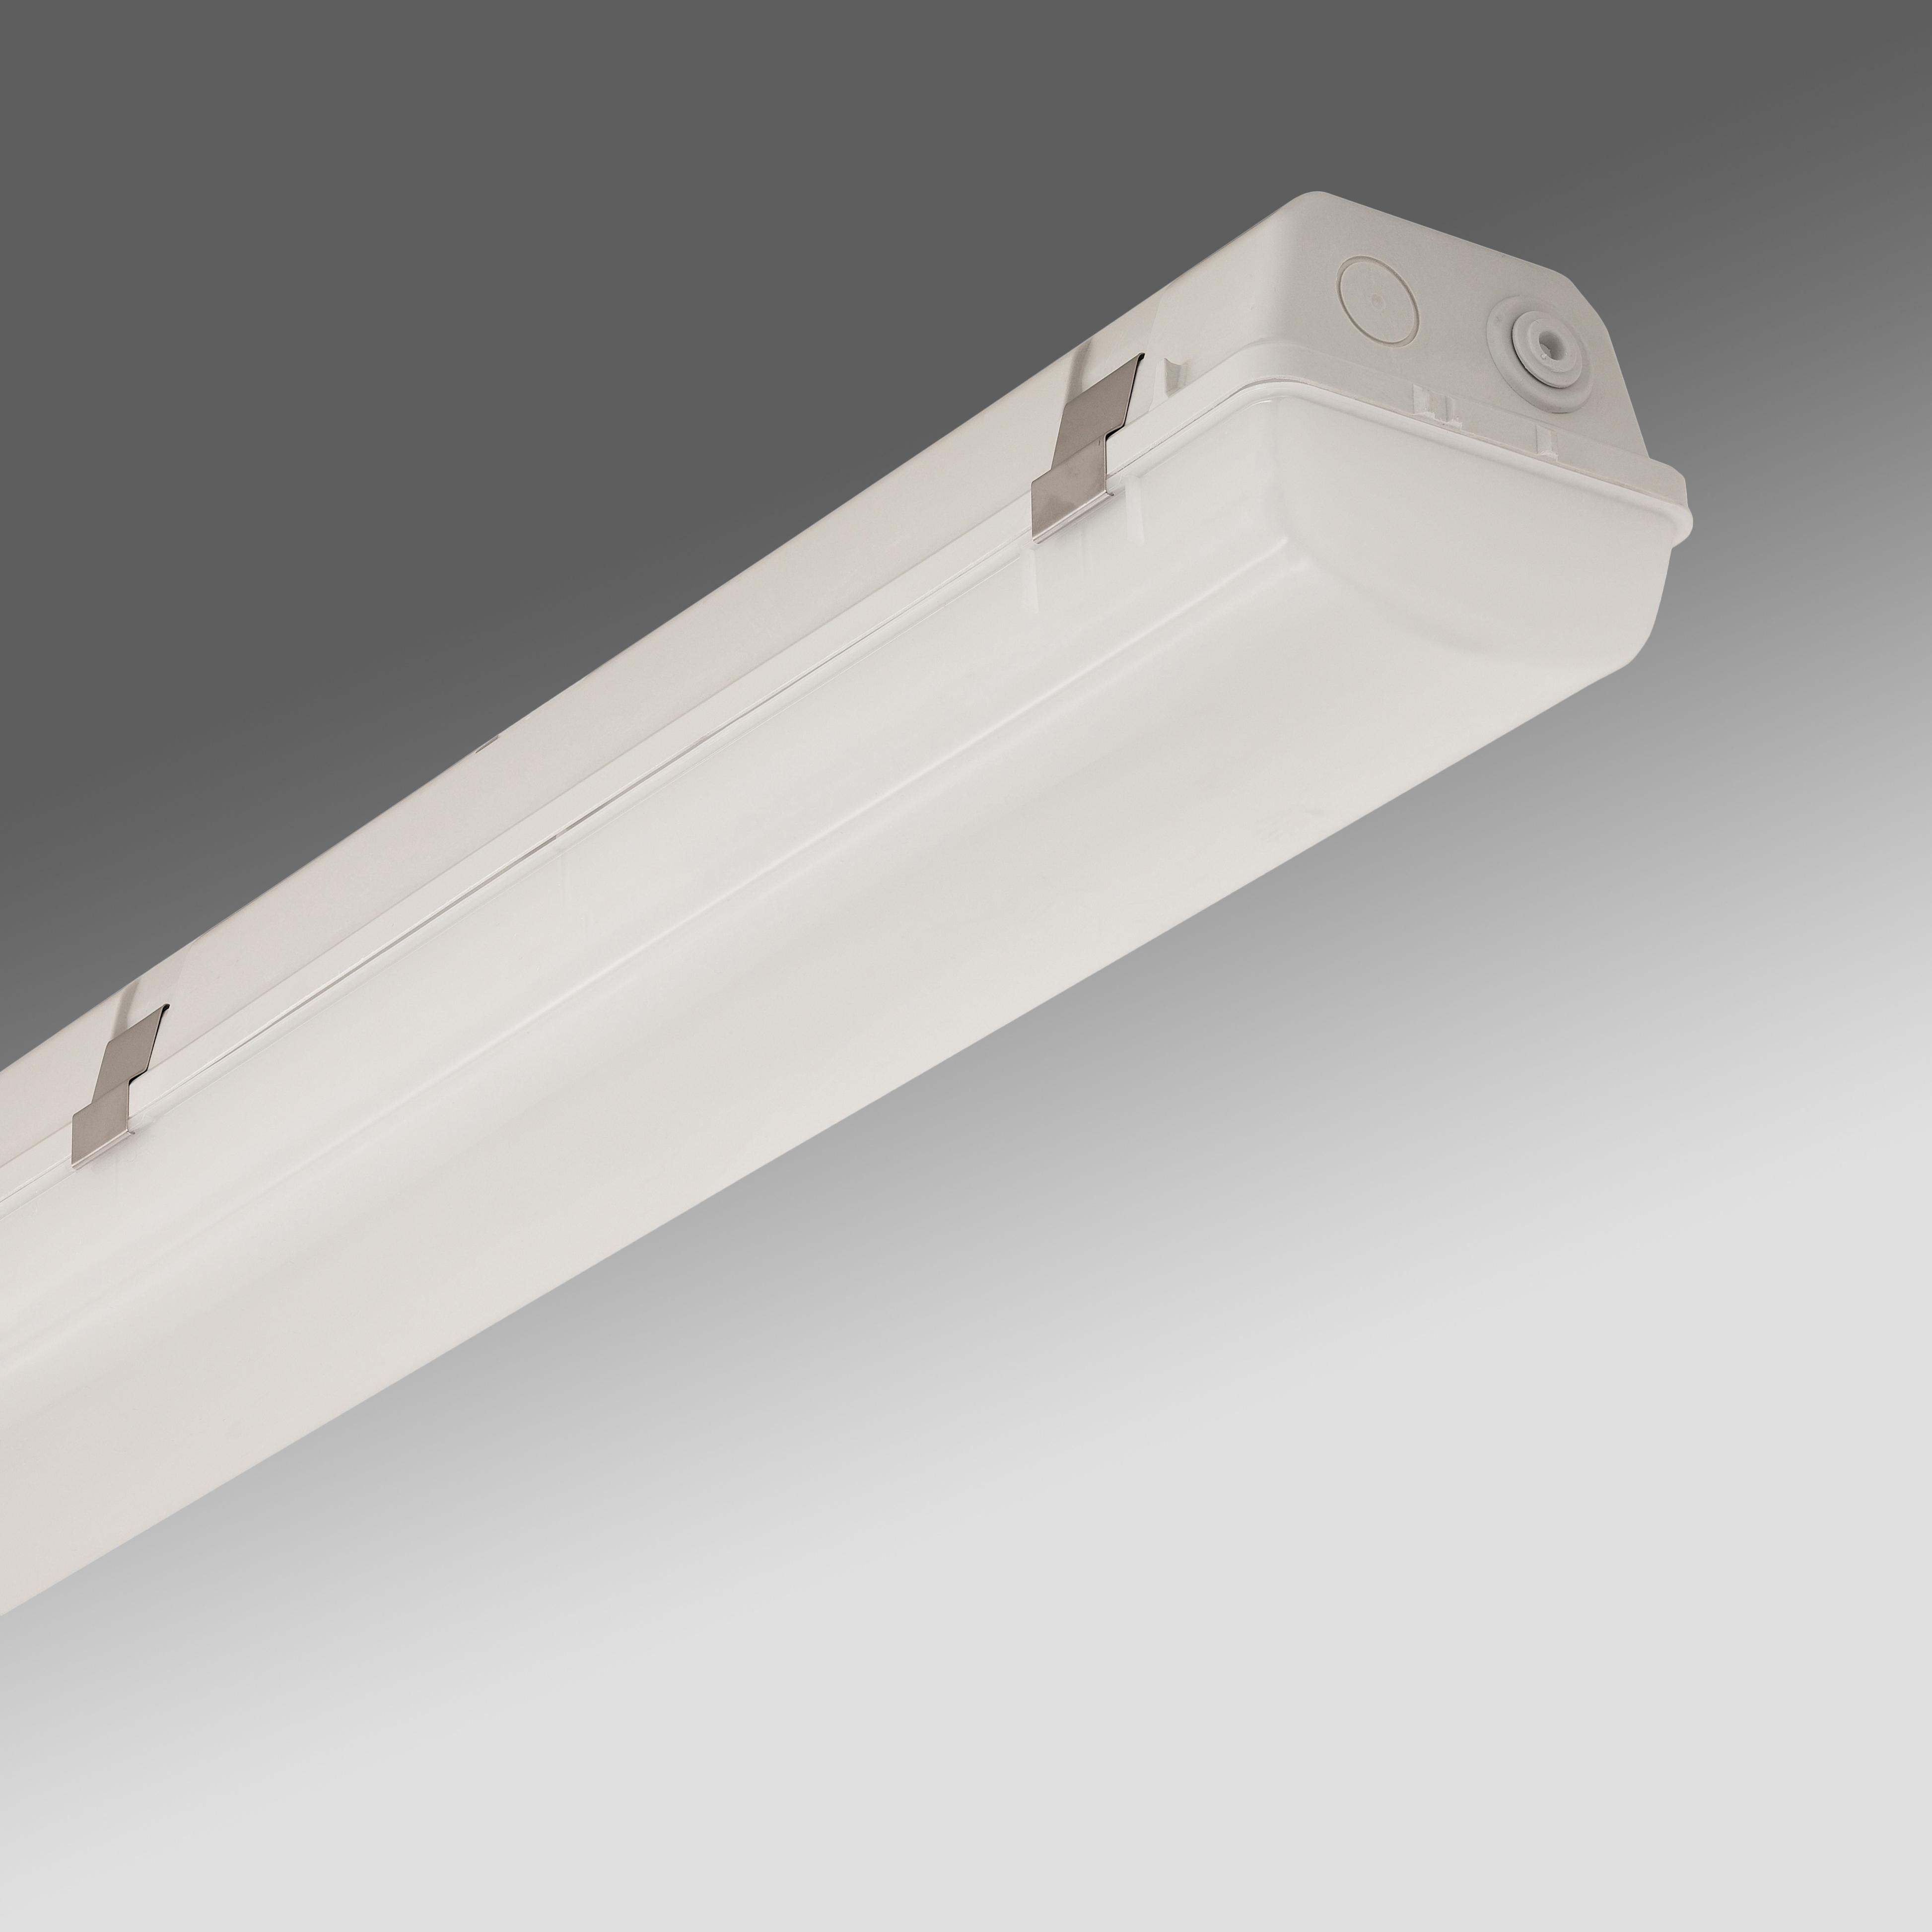 1 Stk Devo LED Pro 73W 840 10200lm 230V EVG IP65 SK I PMMA 1500mm LIVB0005--